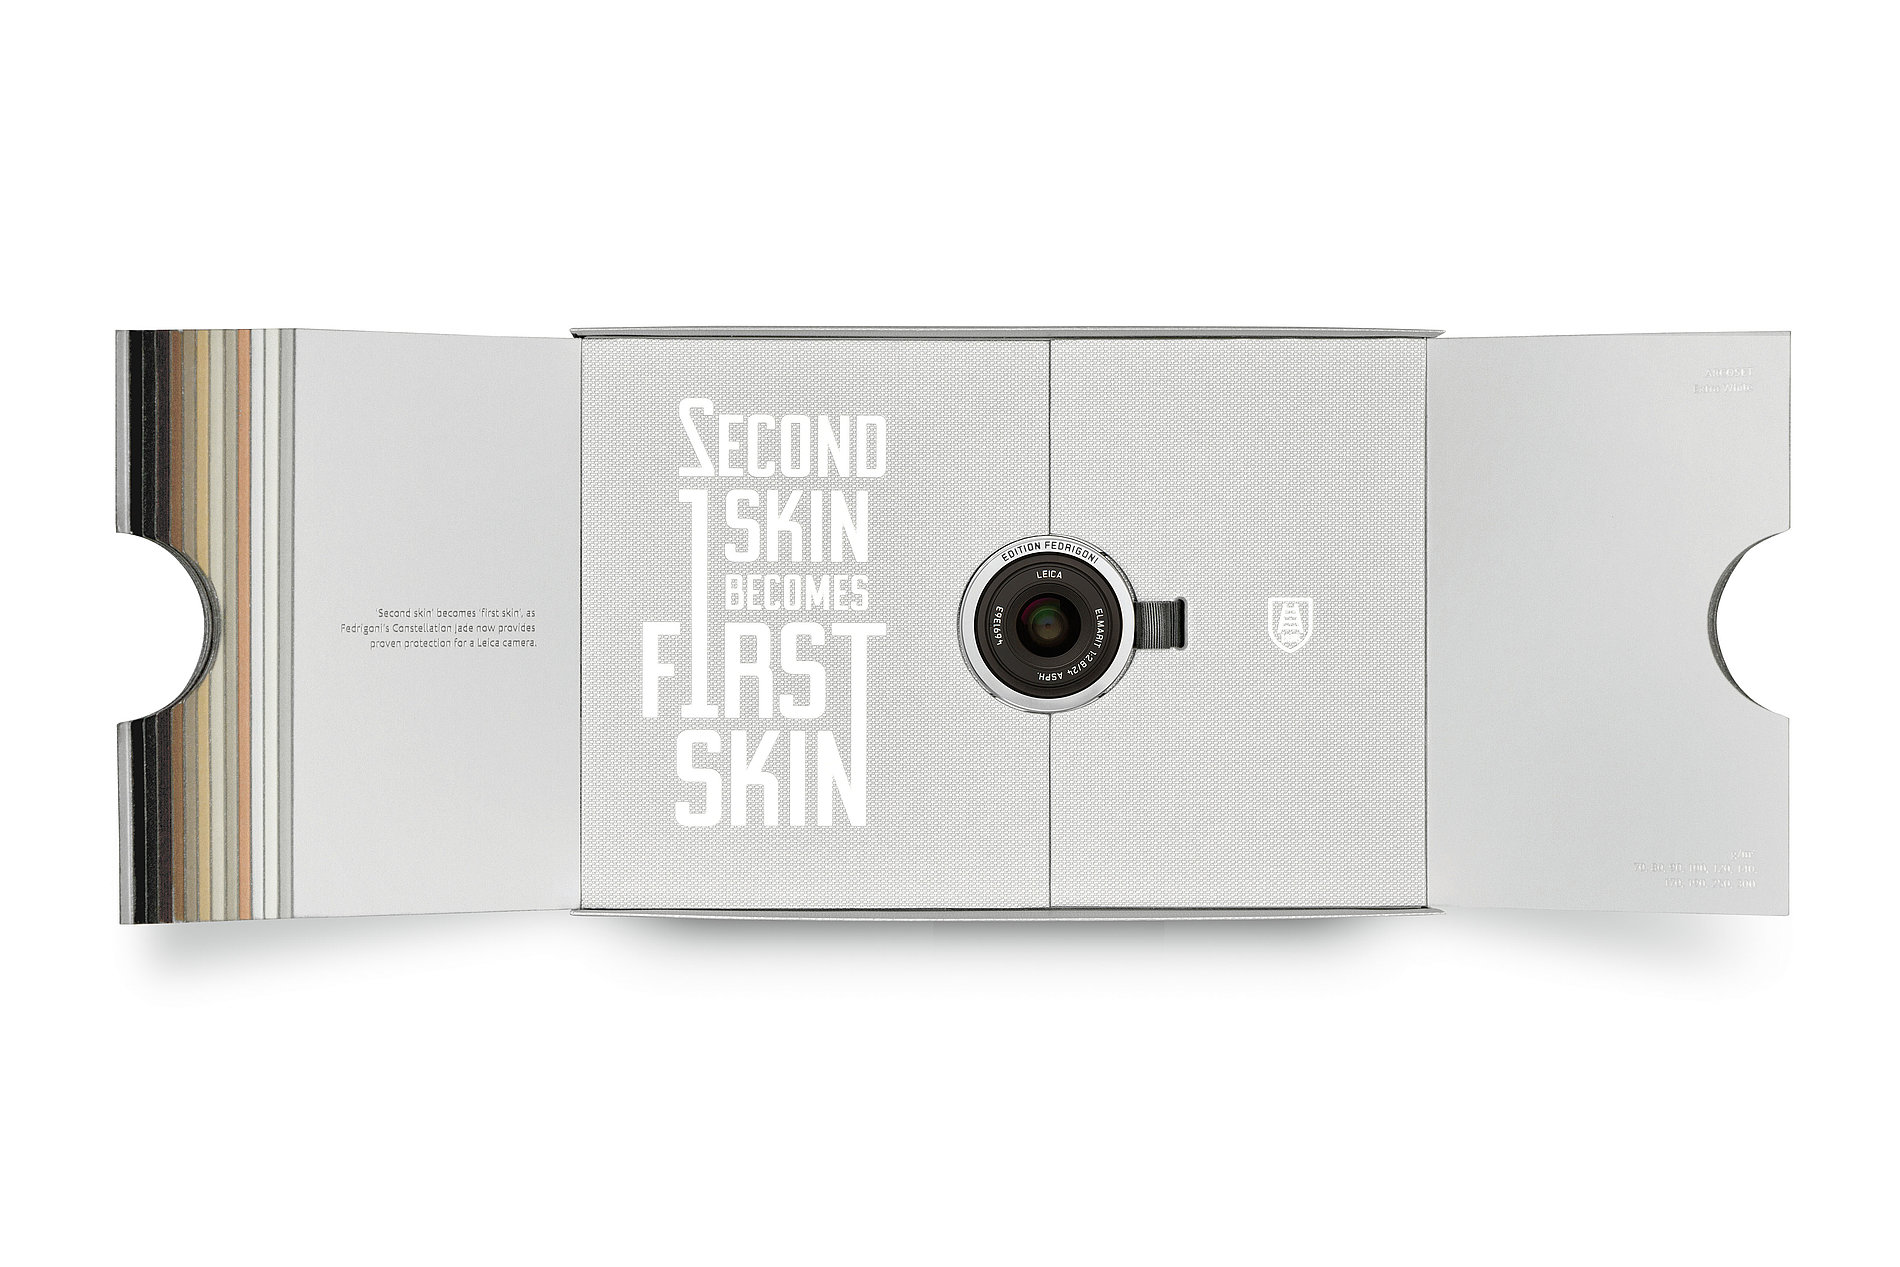 The Paper Skin | Red Dot Design Award